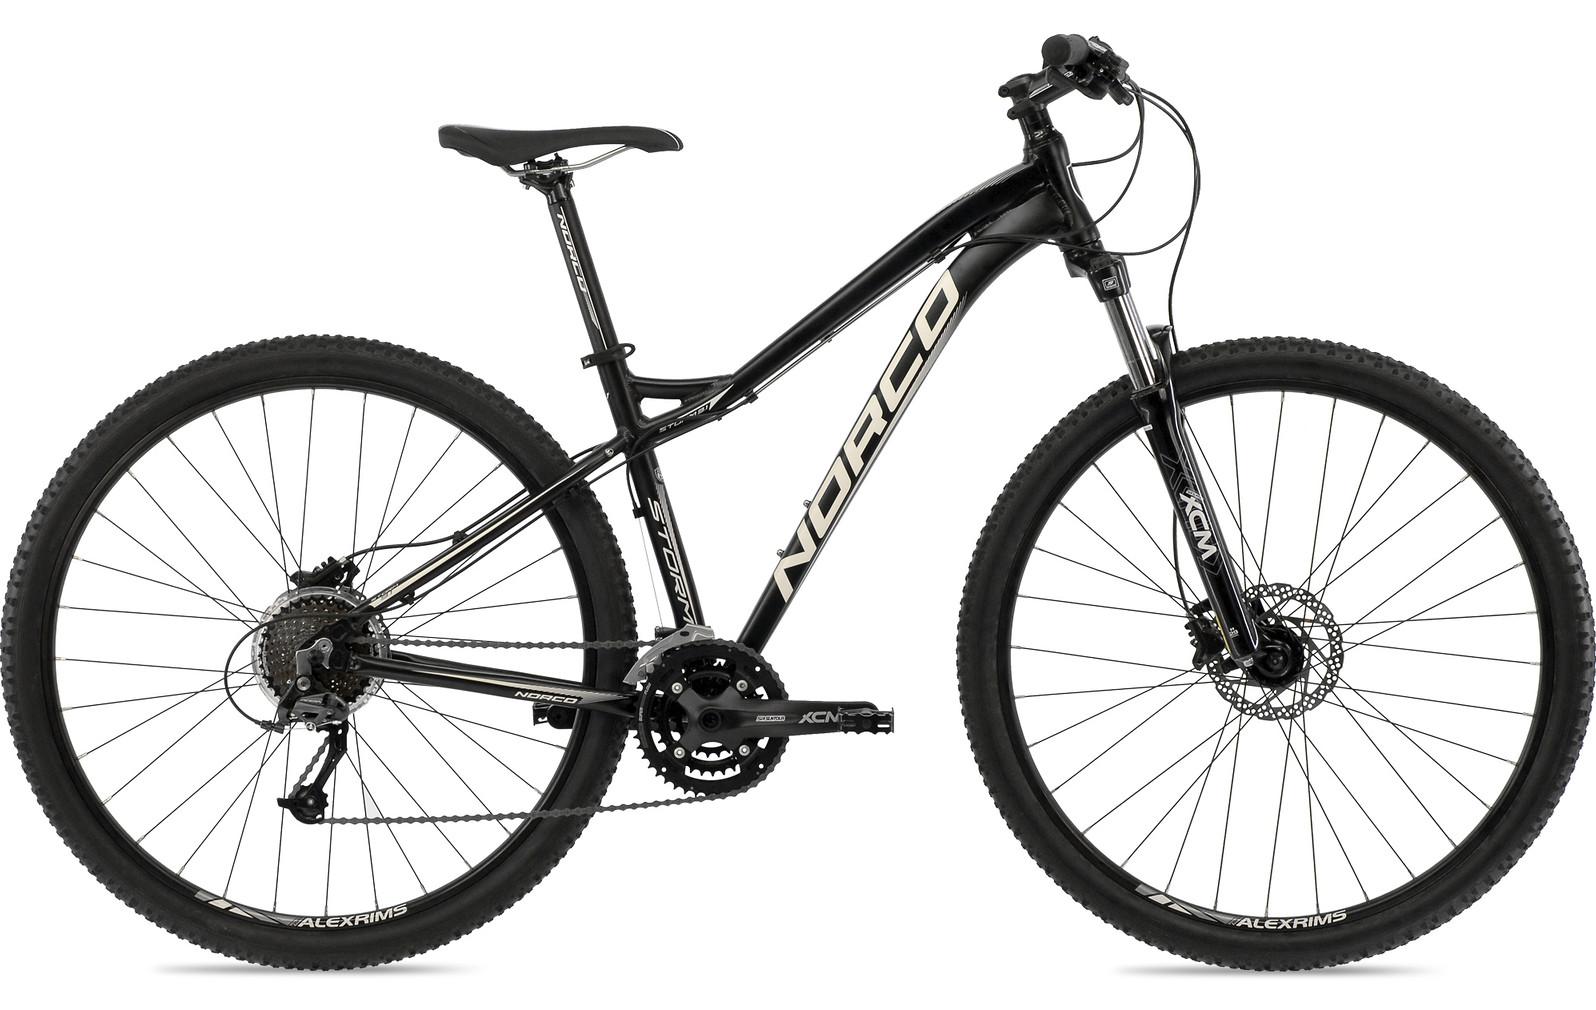 bike - 2014 Norco Storm 9.1 - black